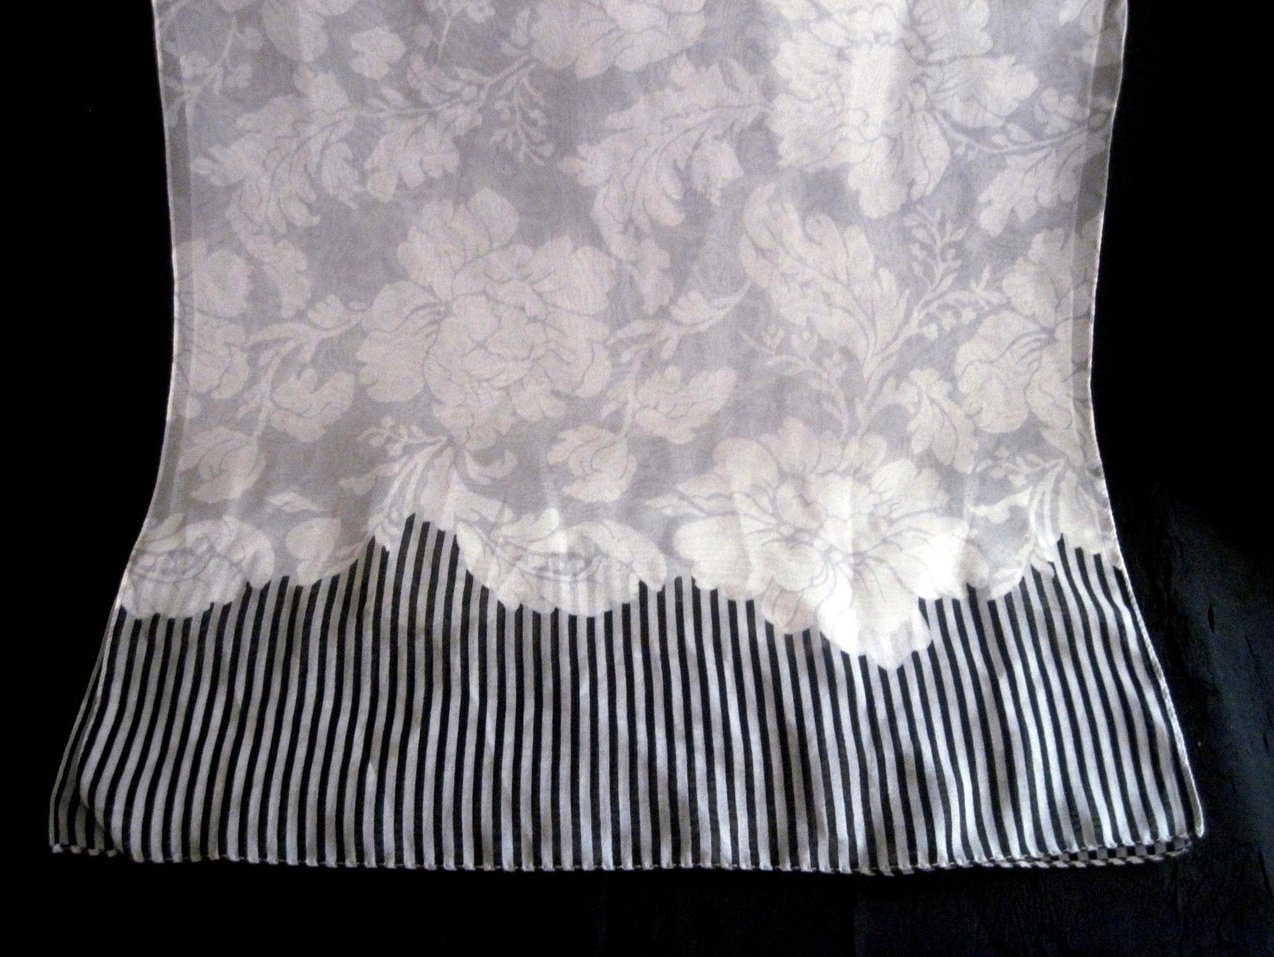 Image 2 of Peony Print Scarf White Gray Black 60 X 15 Semi Sheer